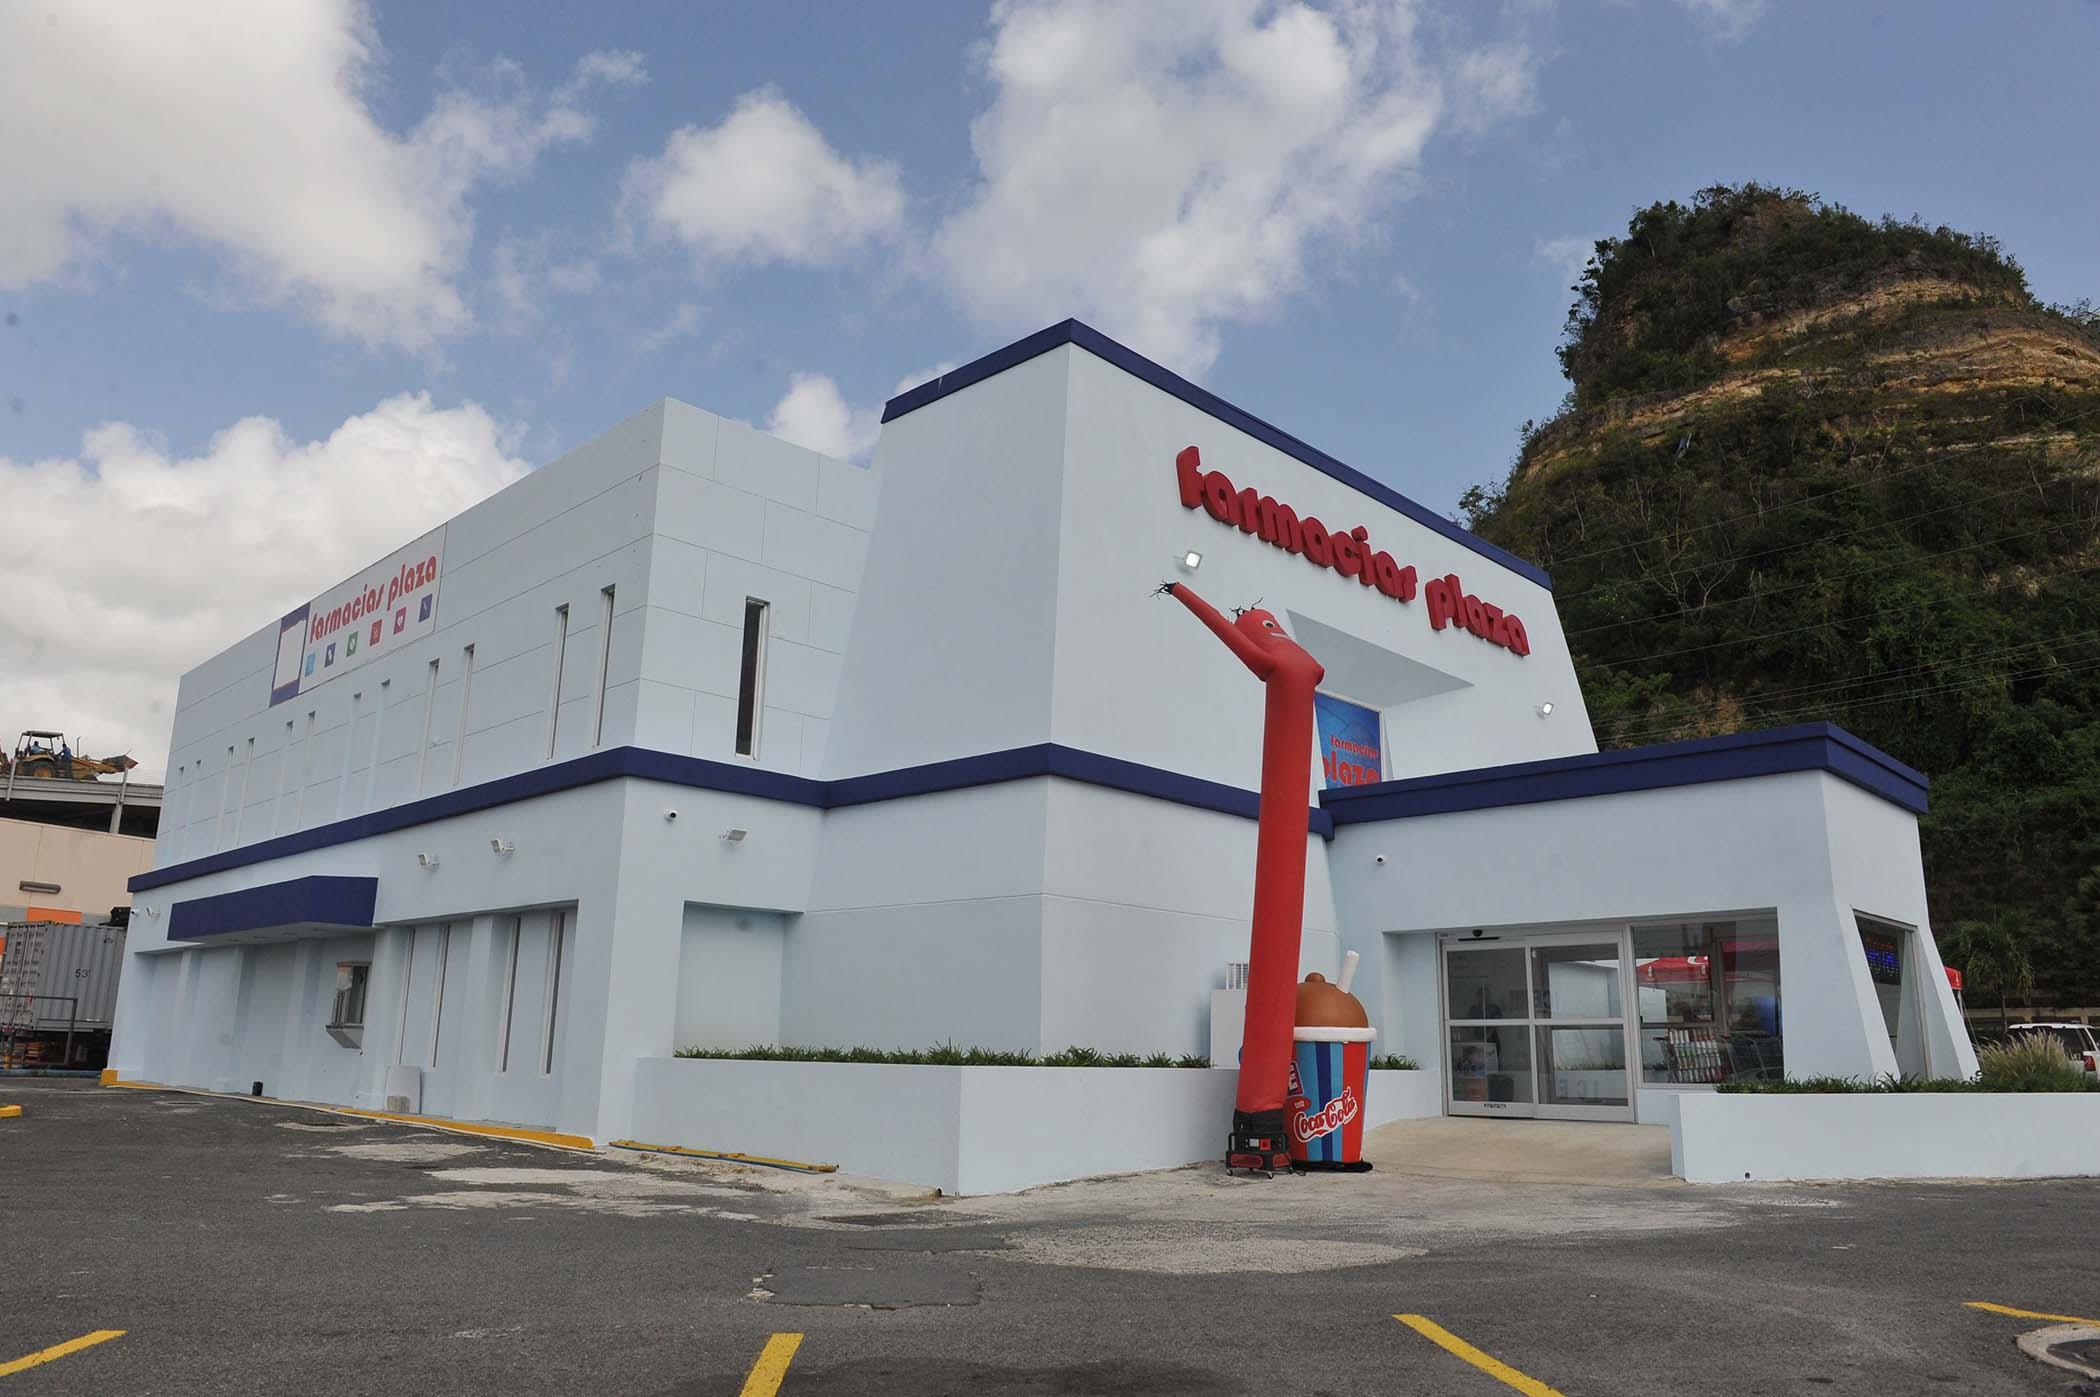 Inauguracion_Farmacias_Plaza-Plaza_del_Sol-4.jpg